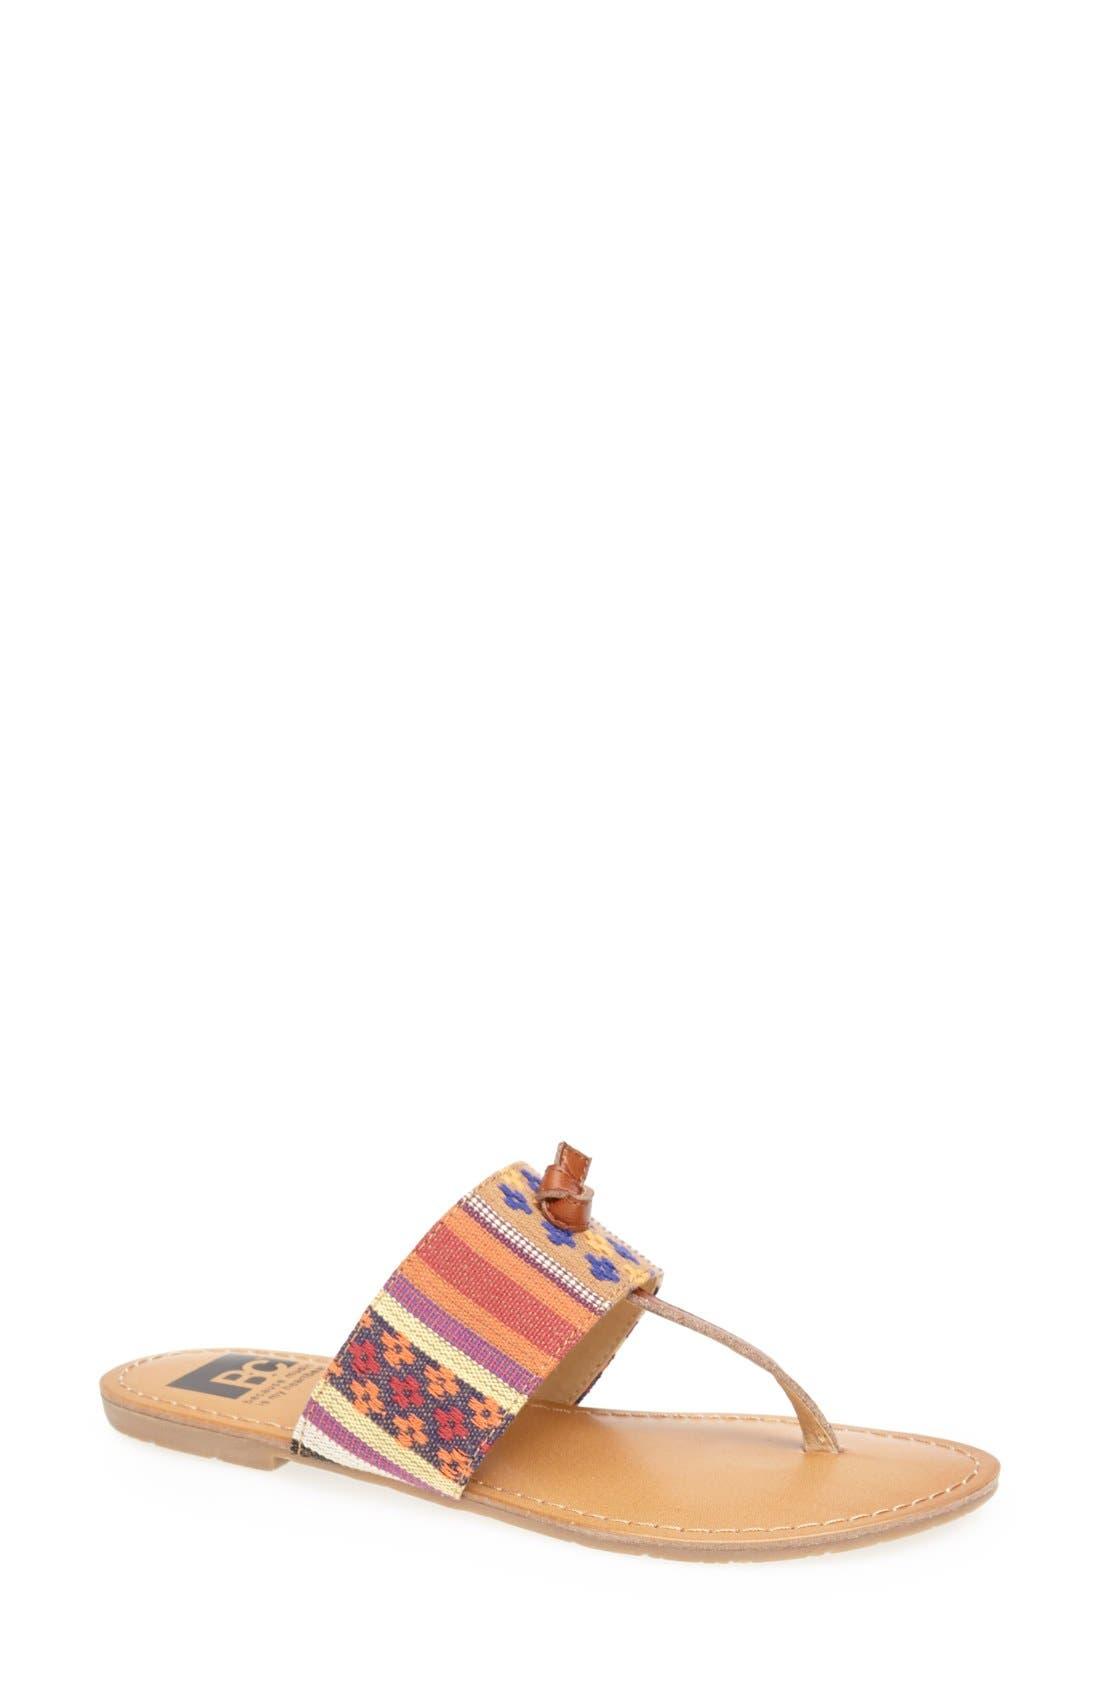 Alternate Image 1 Selected - BC Footwear 'Gotta Try' Thong Sandal (Women)